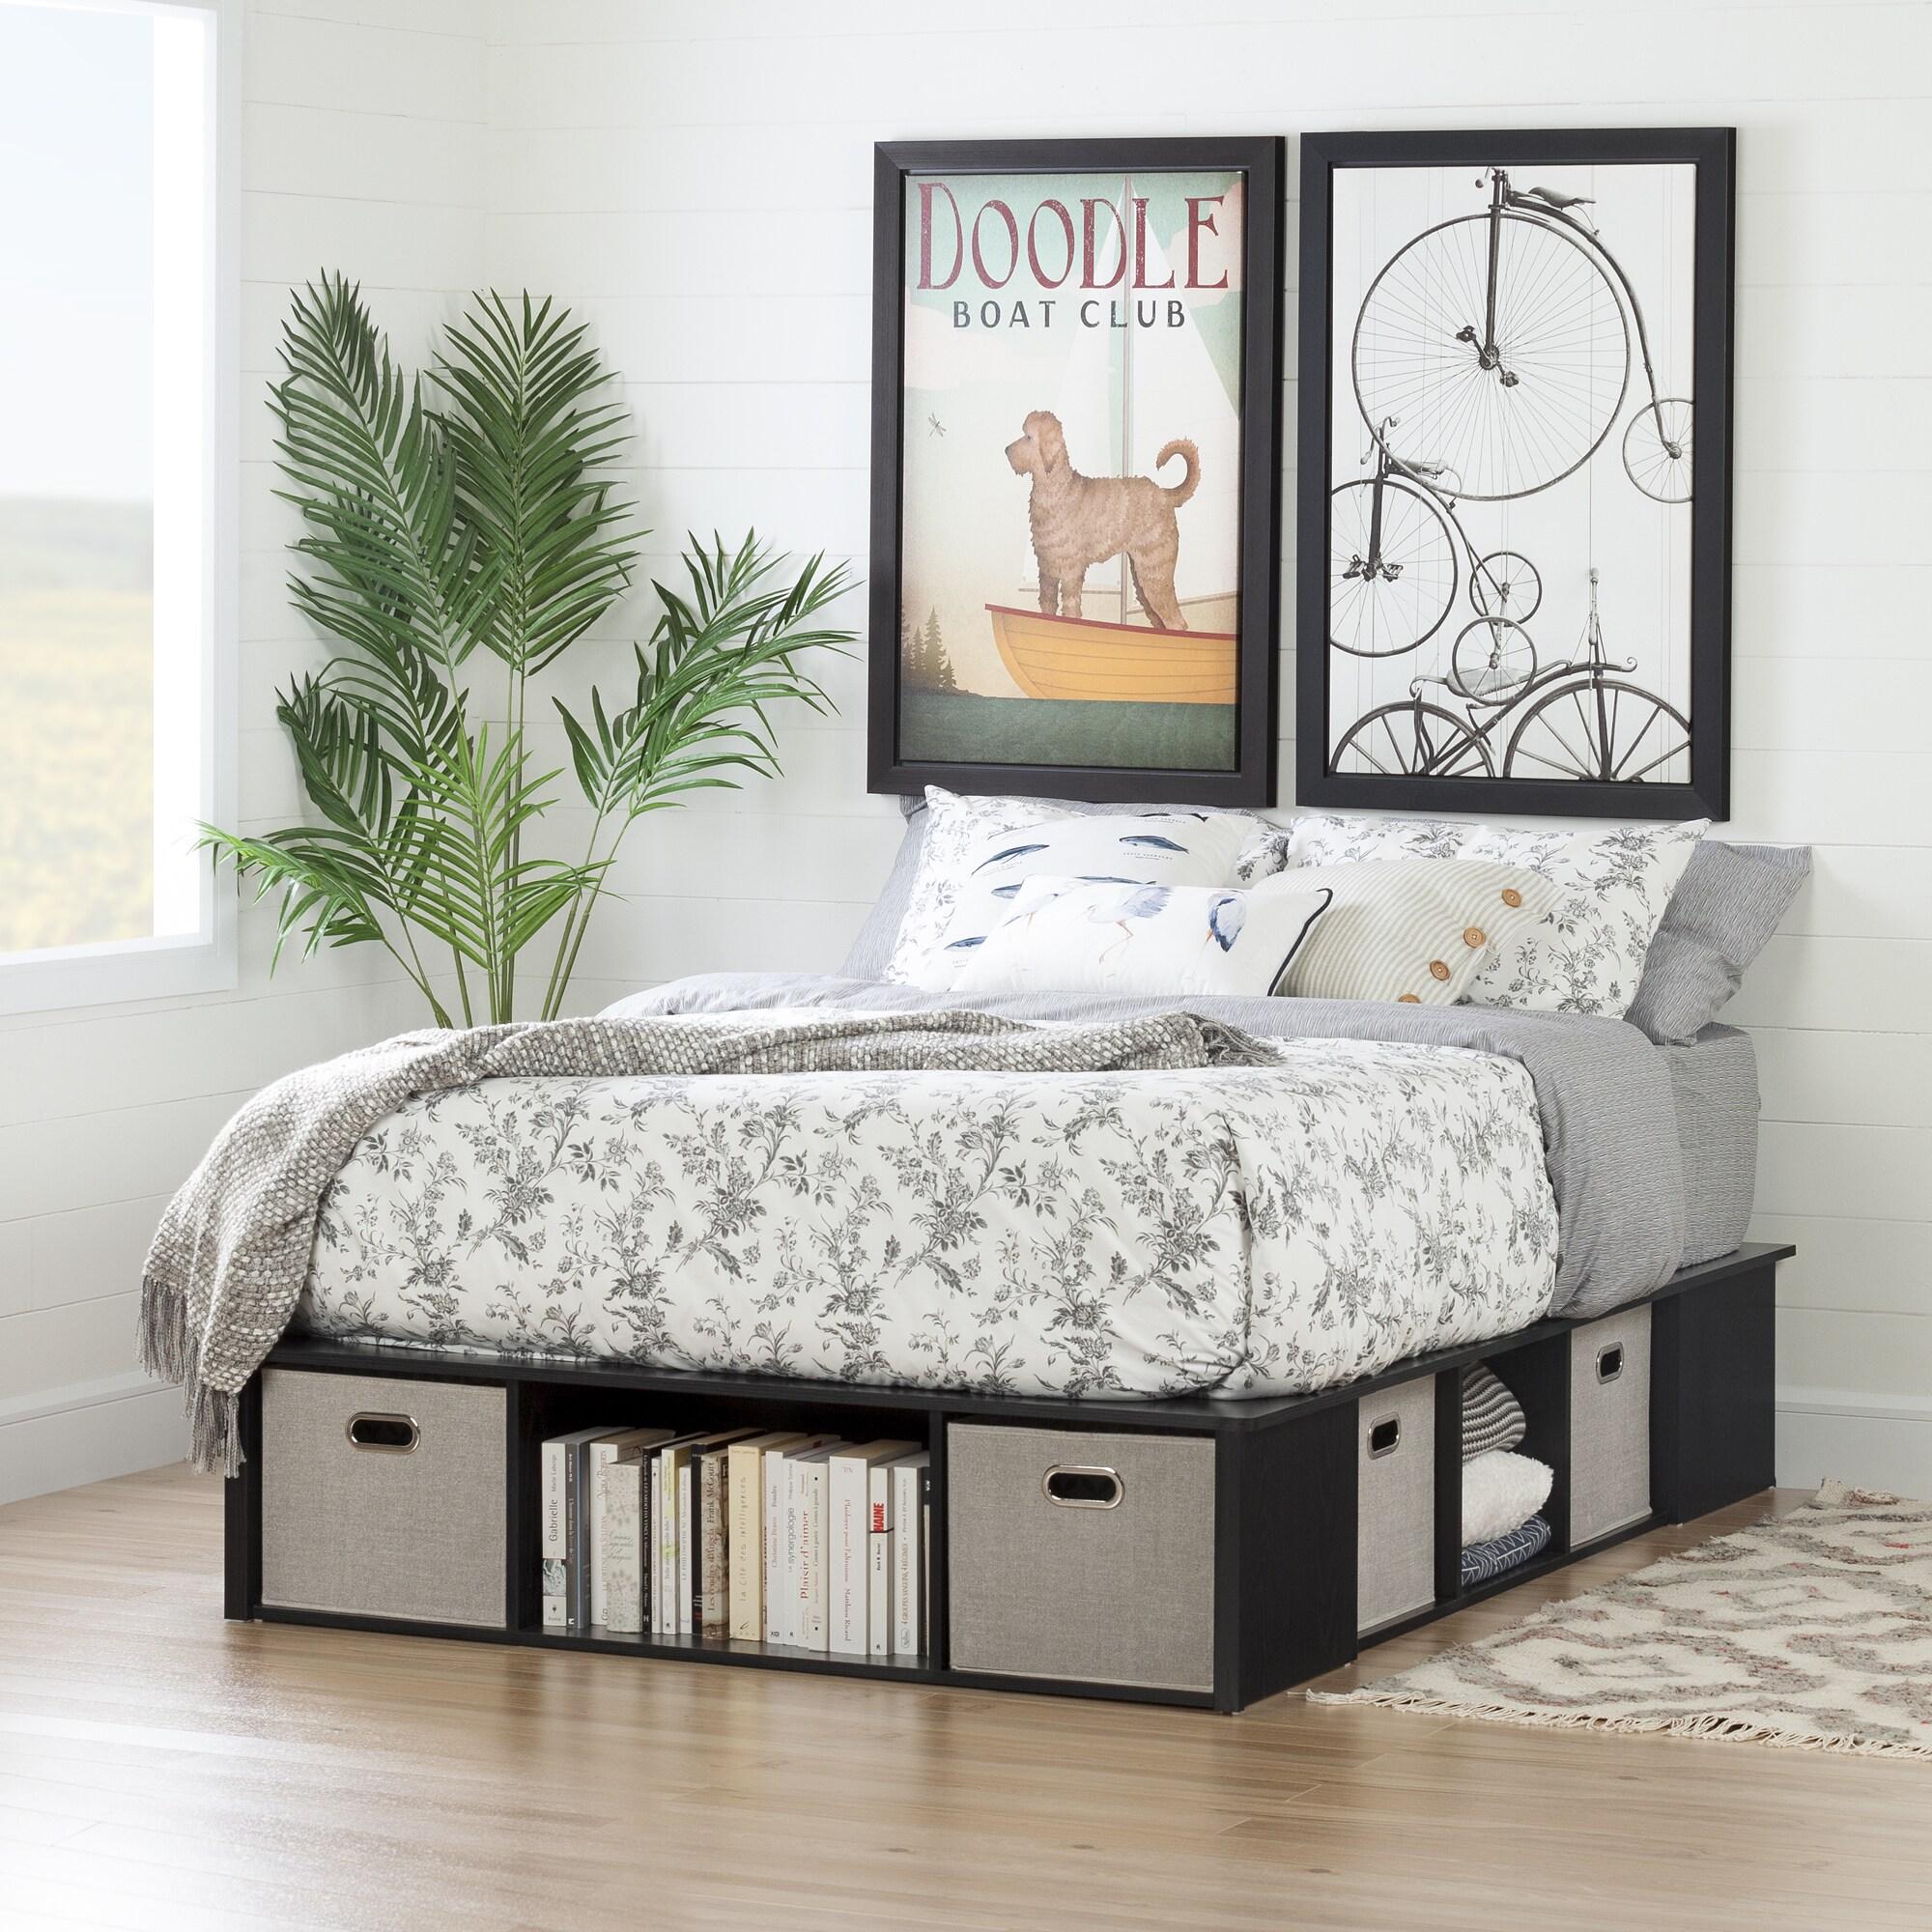 South Shore Flexible Black Oak Full-Size Platform Bed wit...